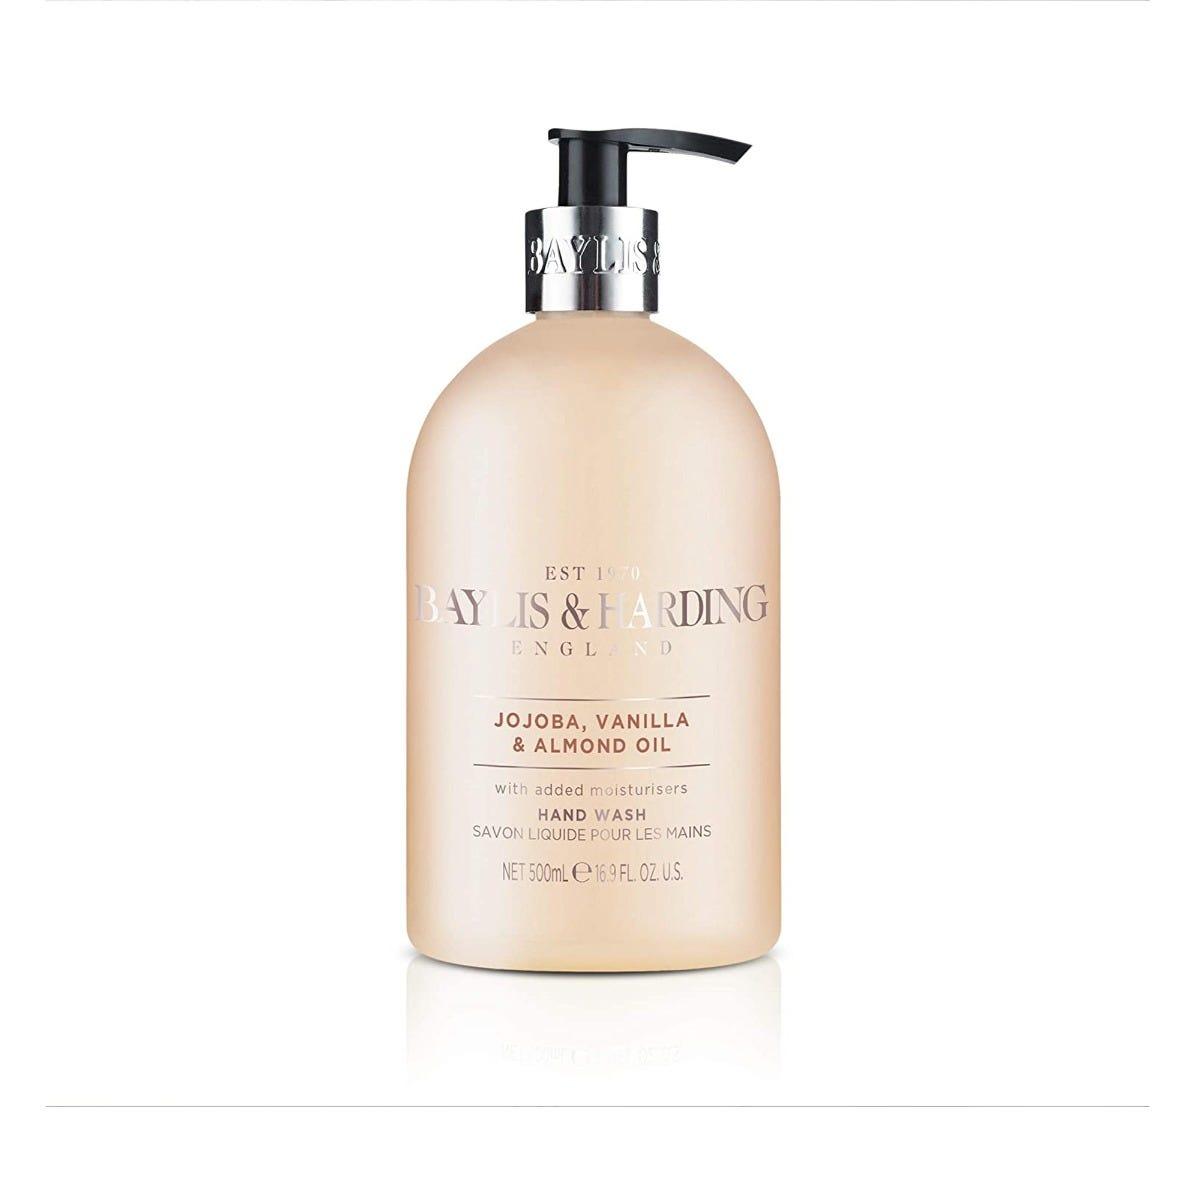 Jabón para manos Baylis & Harding® aroma jojoba y vainilla